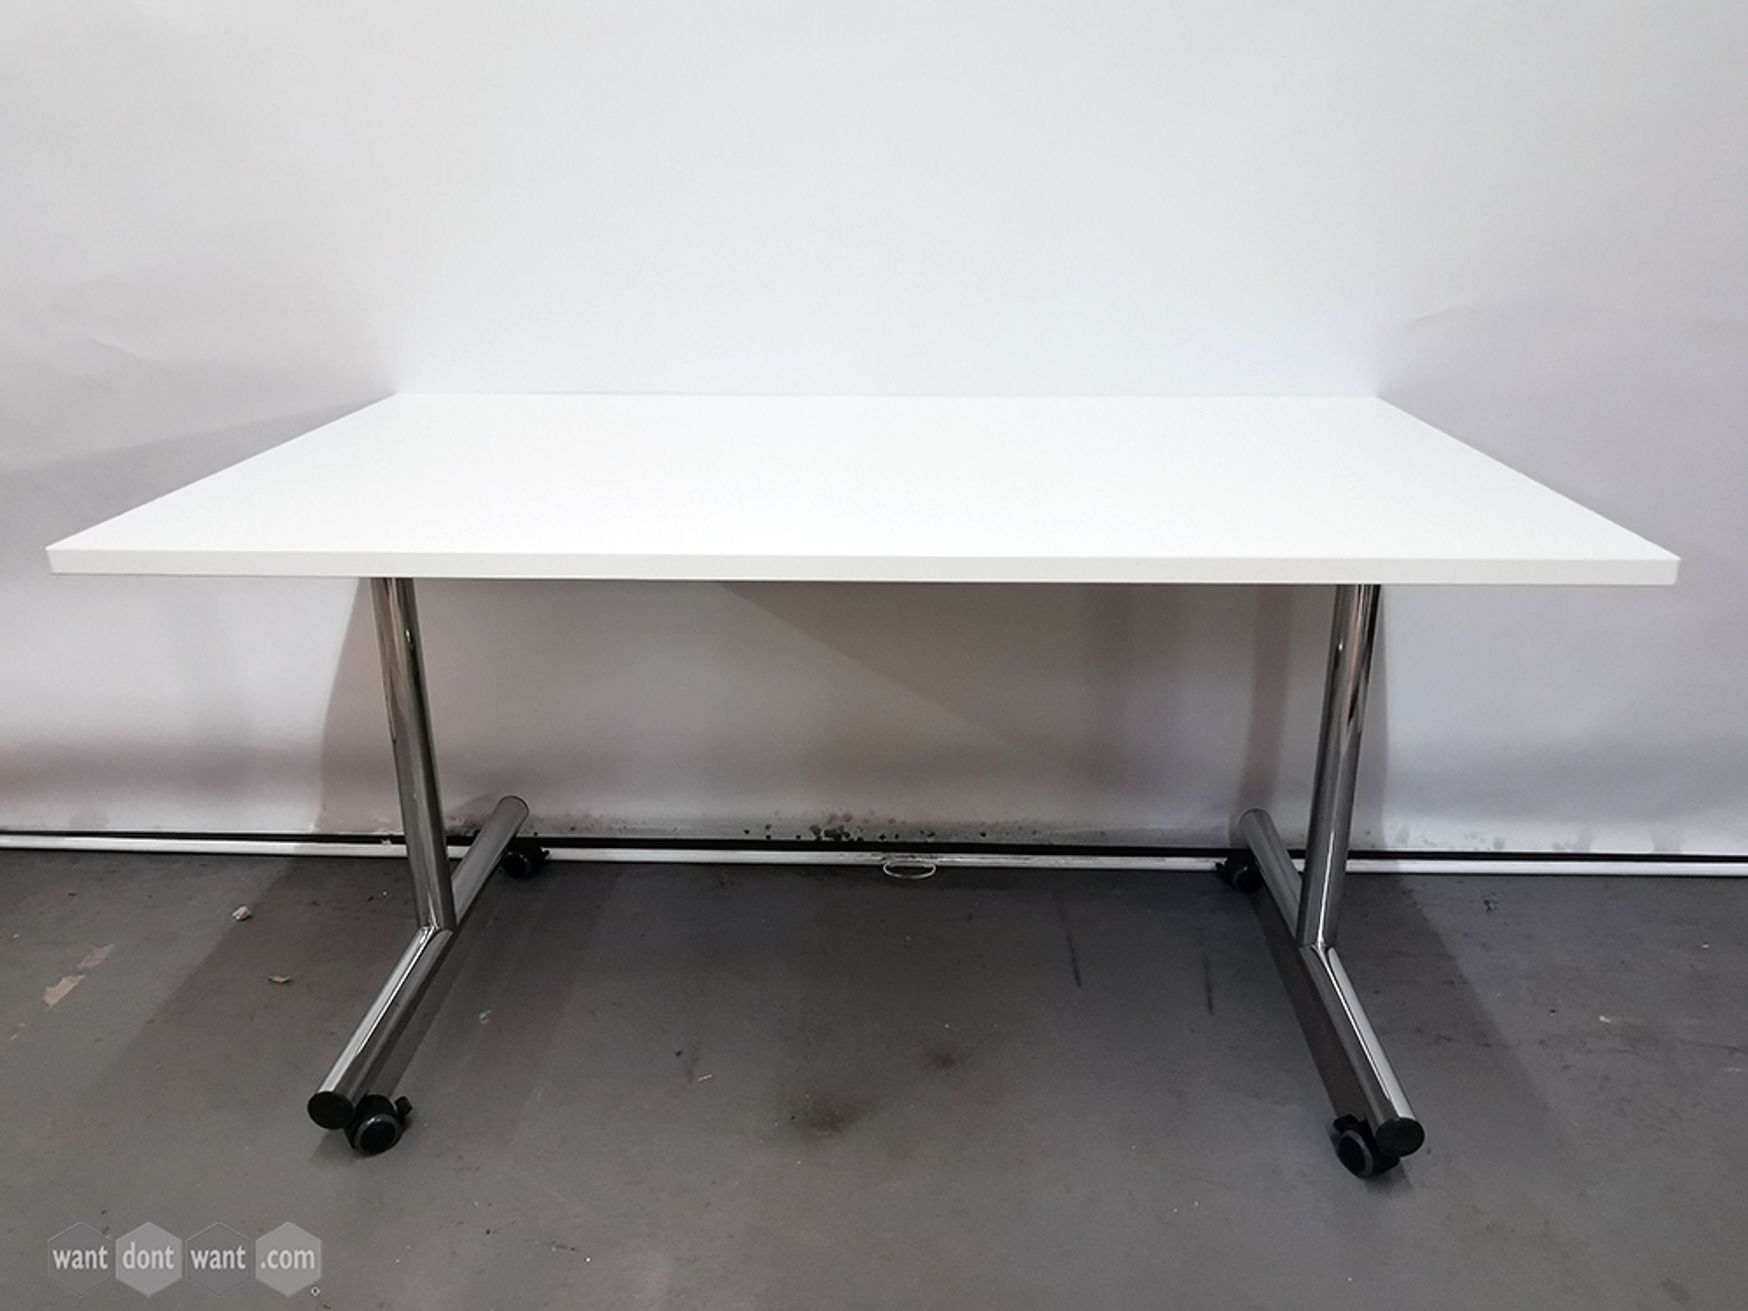 Sven Christiansen Flip-Top Folding Table 1600mm x 800mm